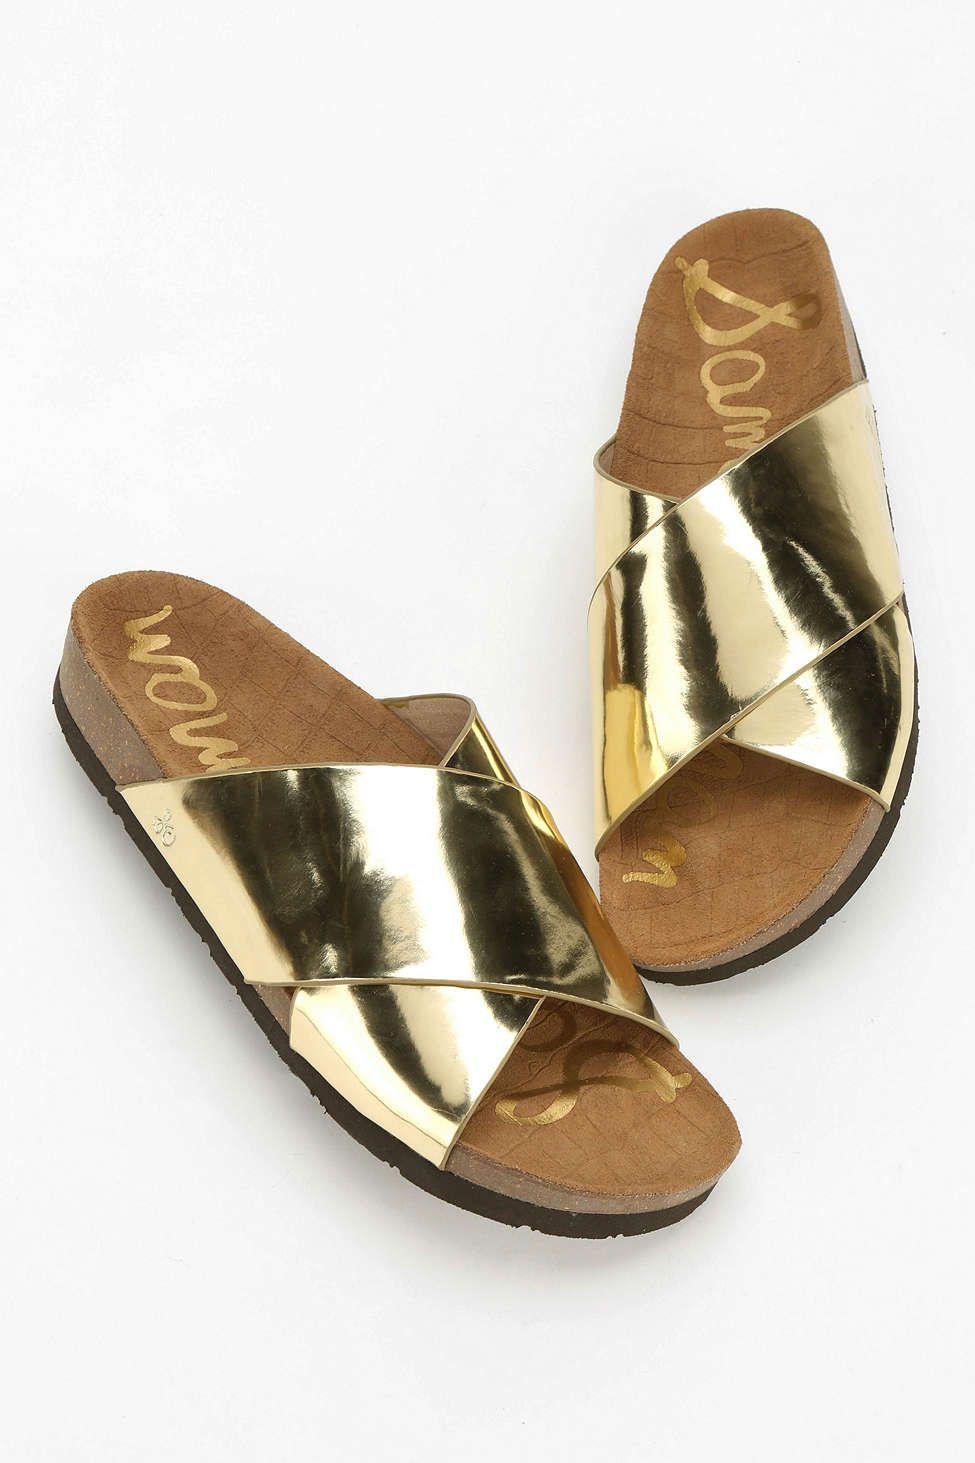 5176e77177e8 Sam Edelman Adora Metallic Slide Sandal - Urban Outfitters